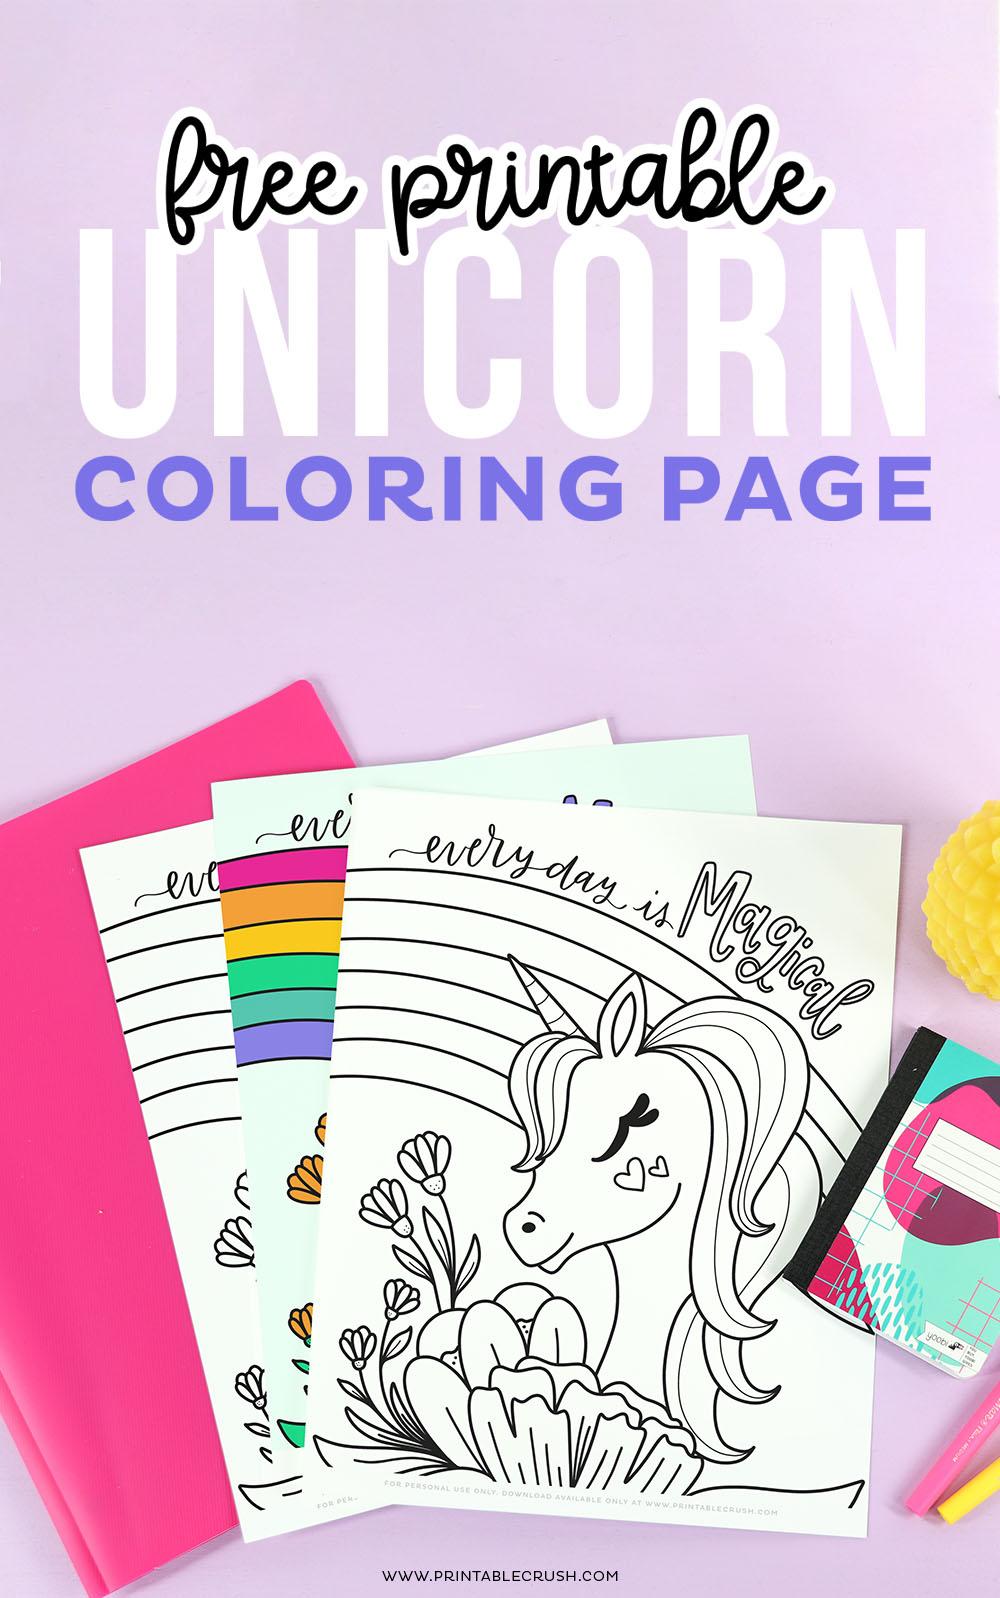 Unicorn Coloring Sheet Free Printable